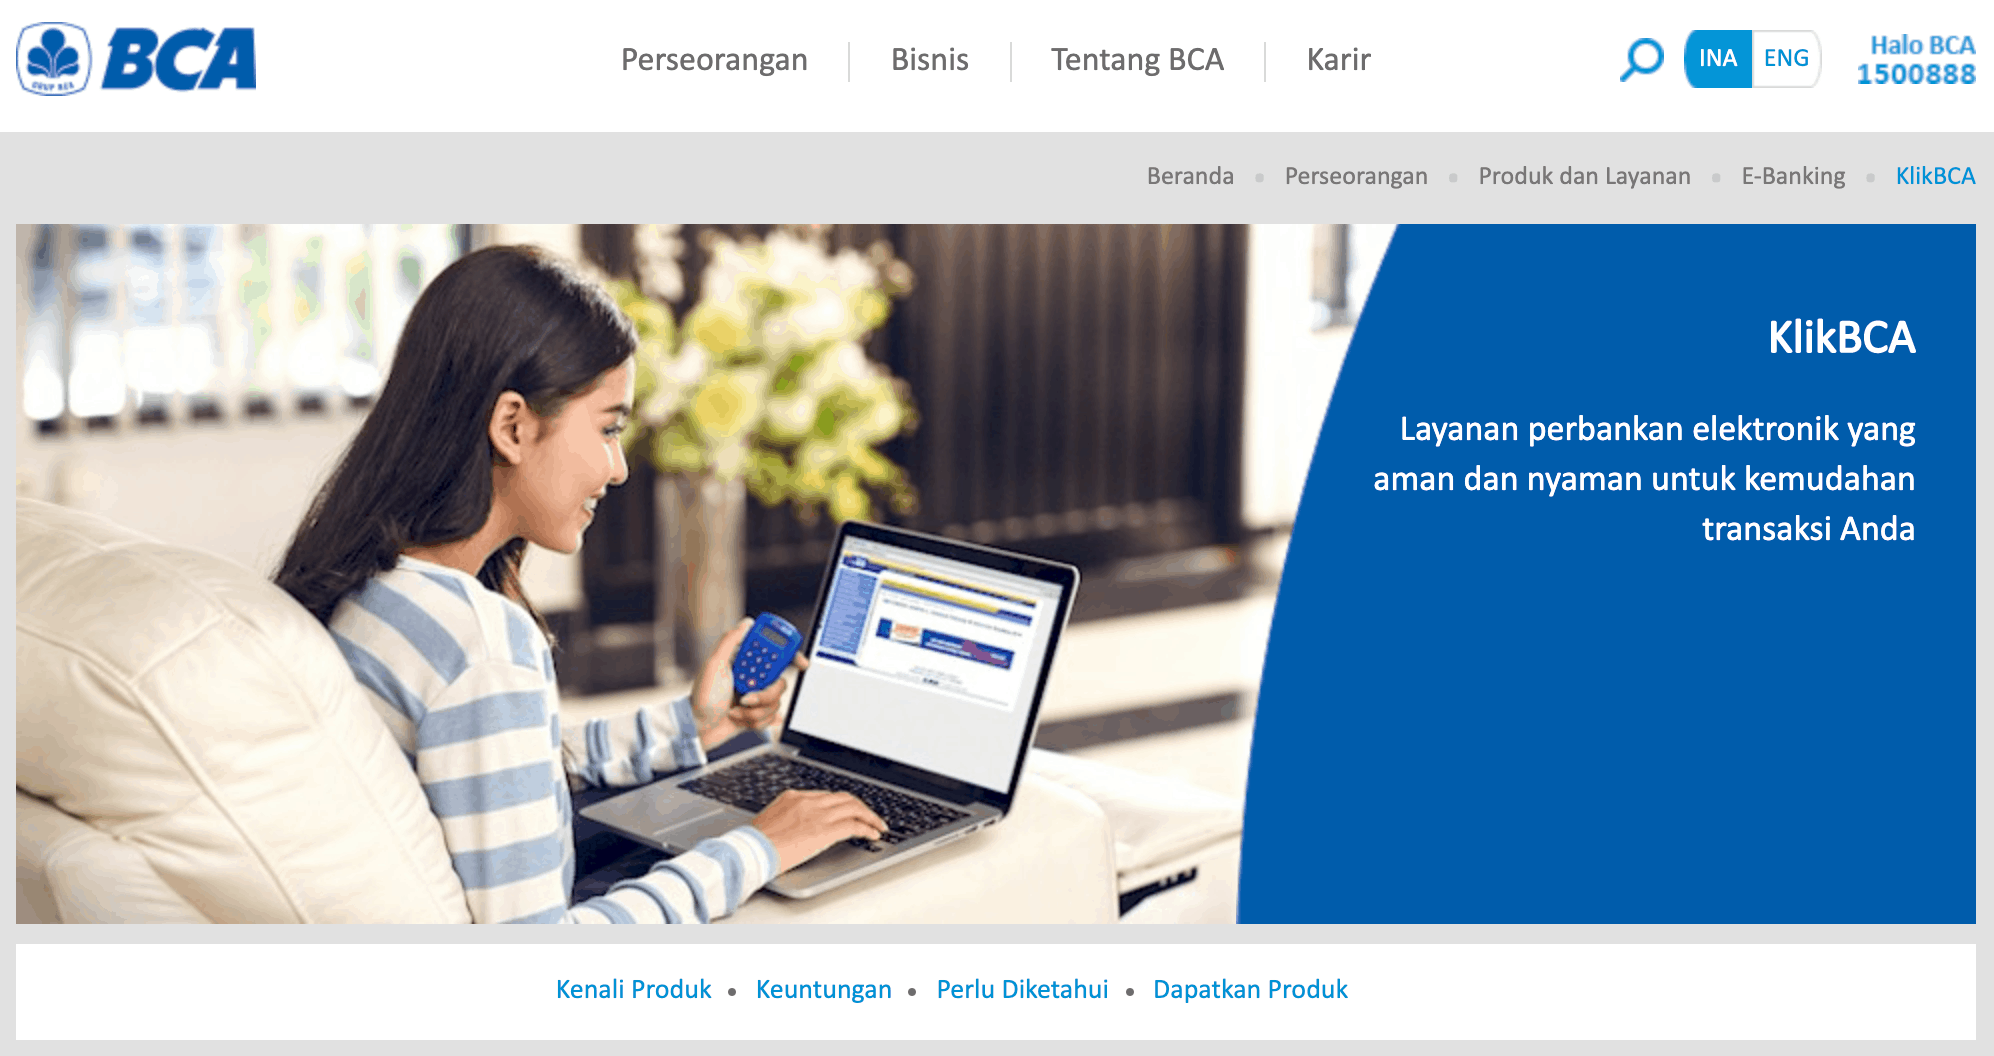 Fitur KlikBCA untuk internet banking